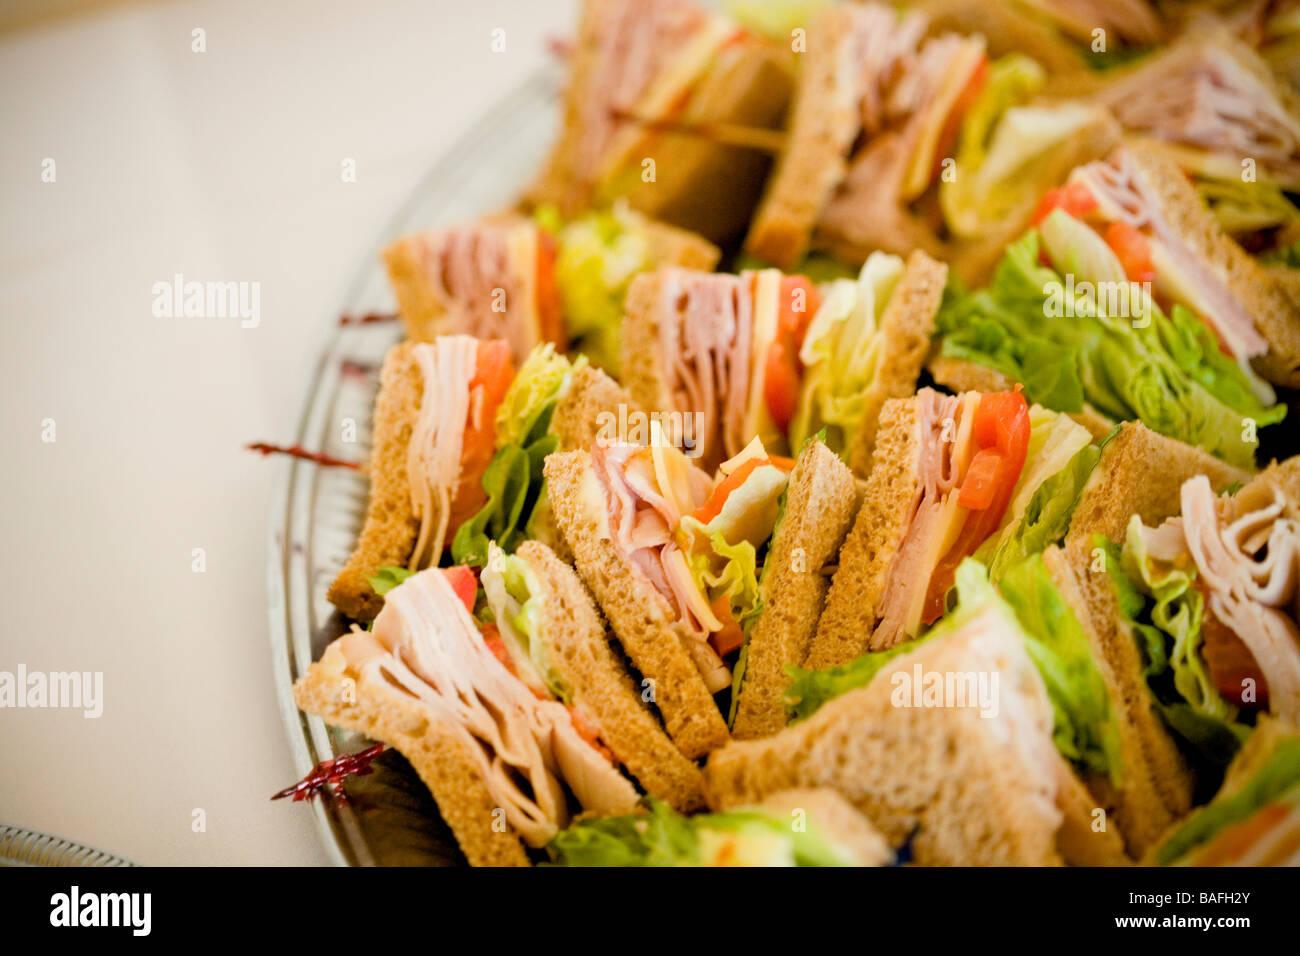 Sandwich Snack Fresh Food Turkey Club Ham Sandwich Platter Stock Photo Alamy